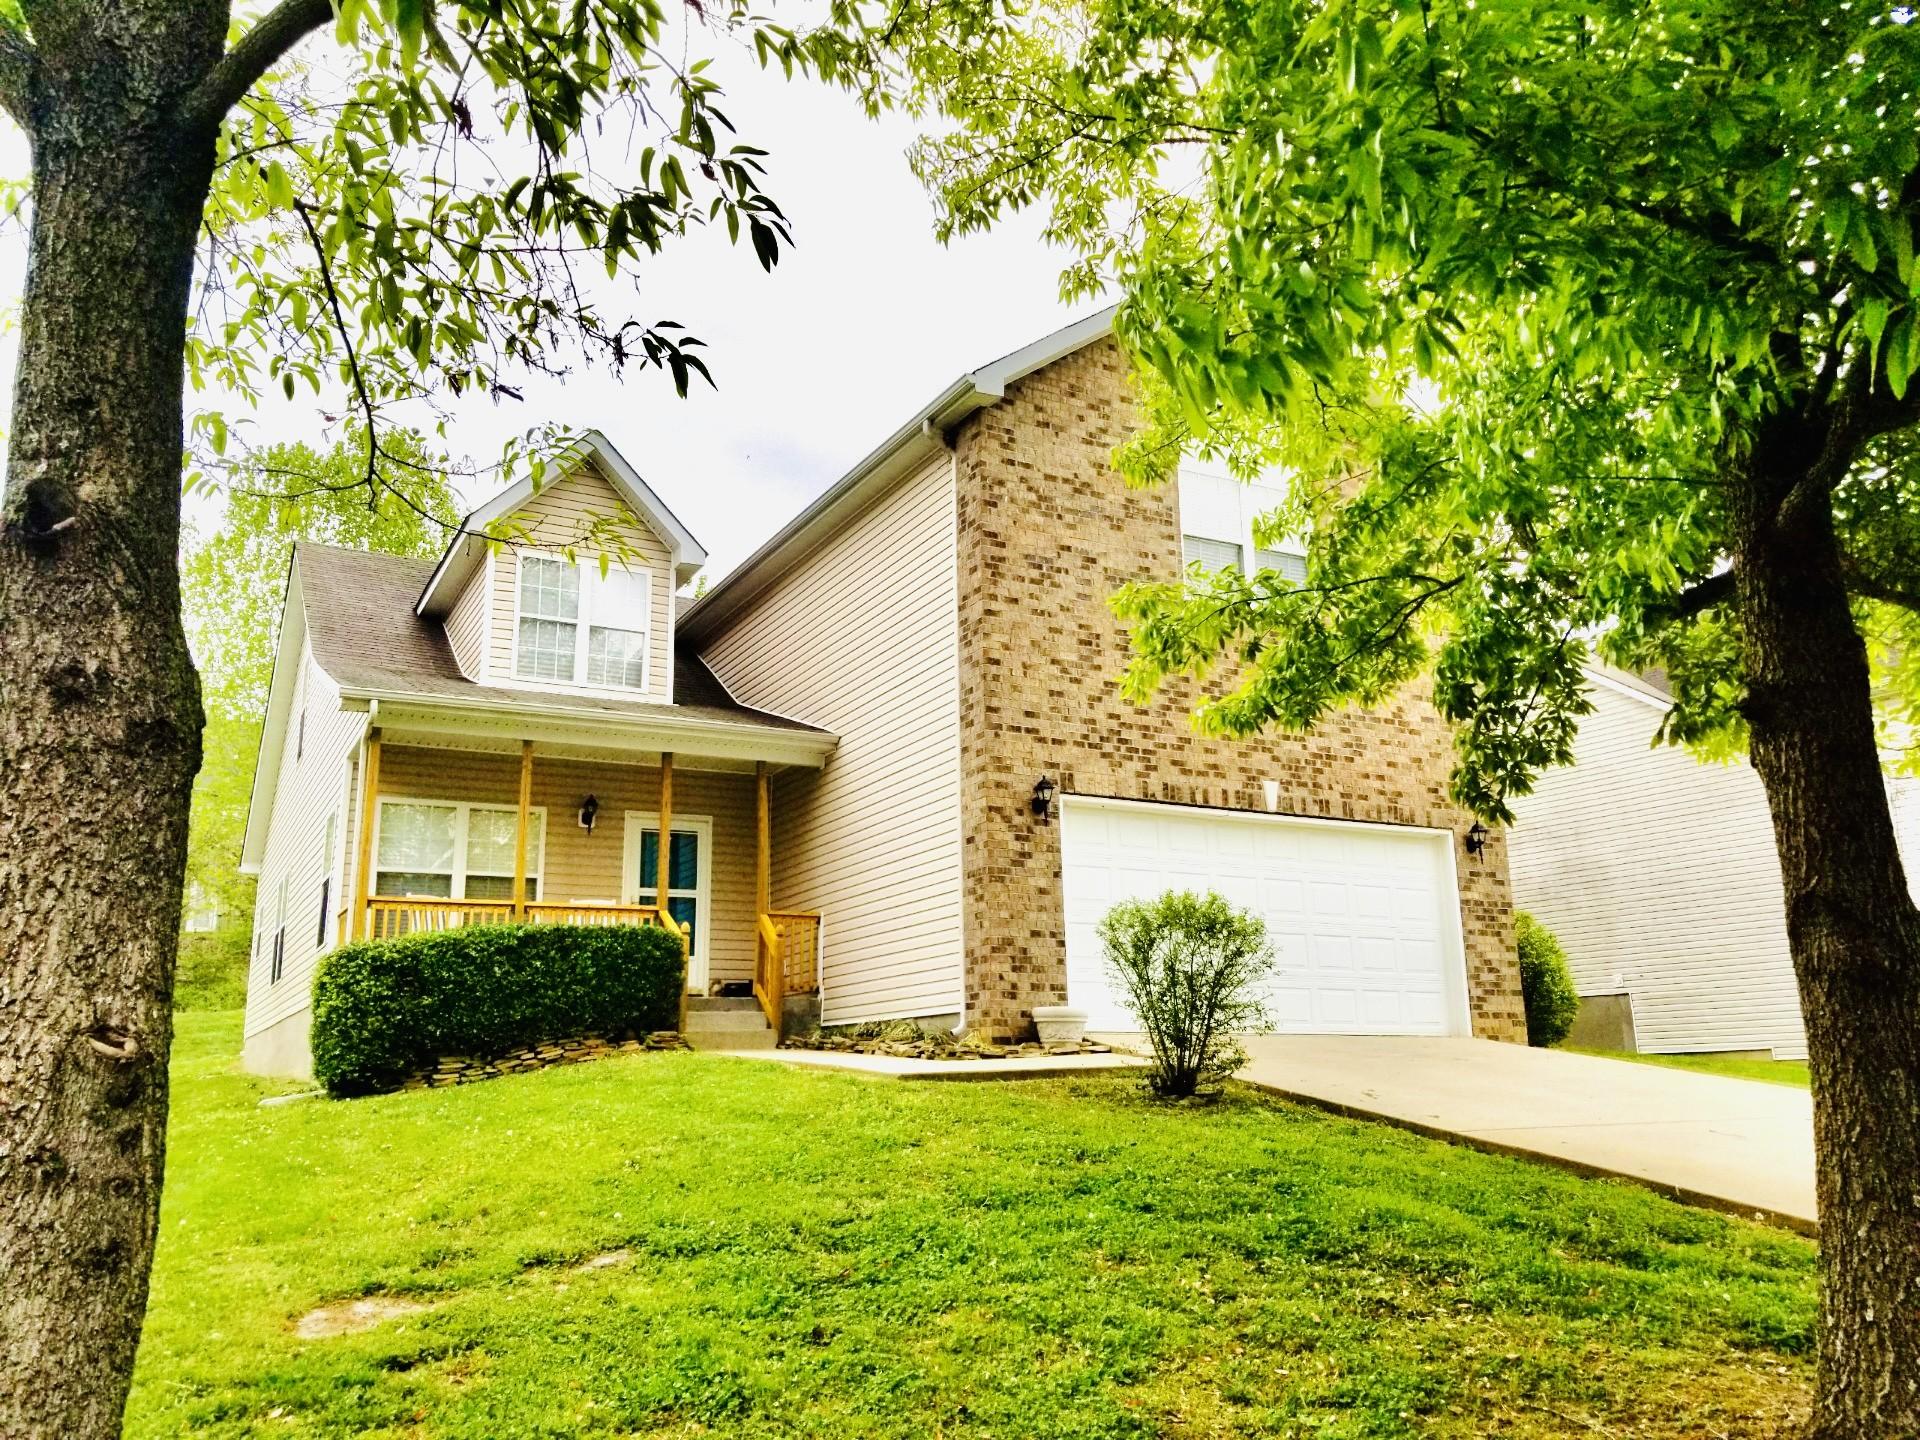 142 Lyndhurst Dr Property Photo - LA VERGNE, TN real estate listing